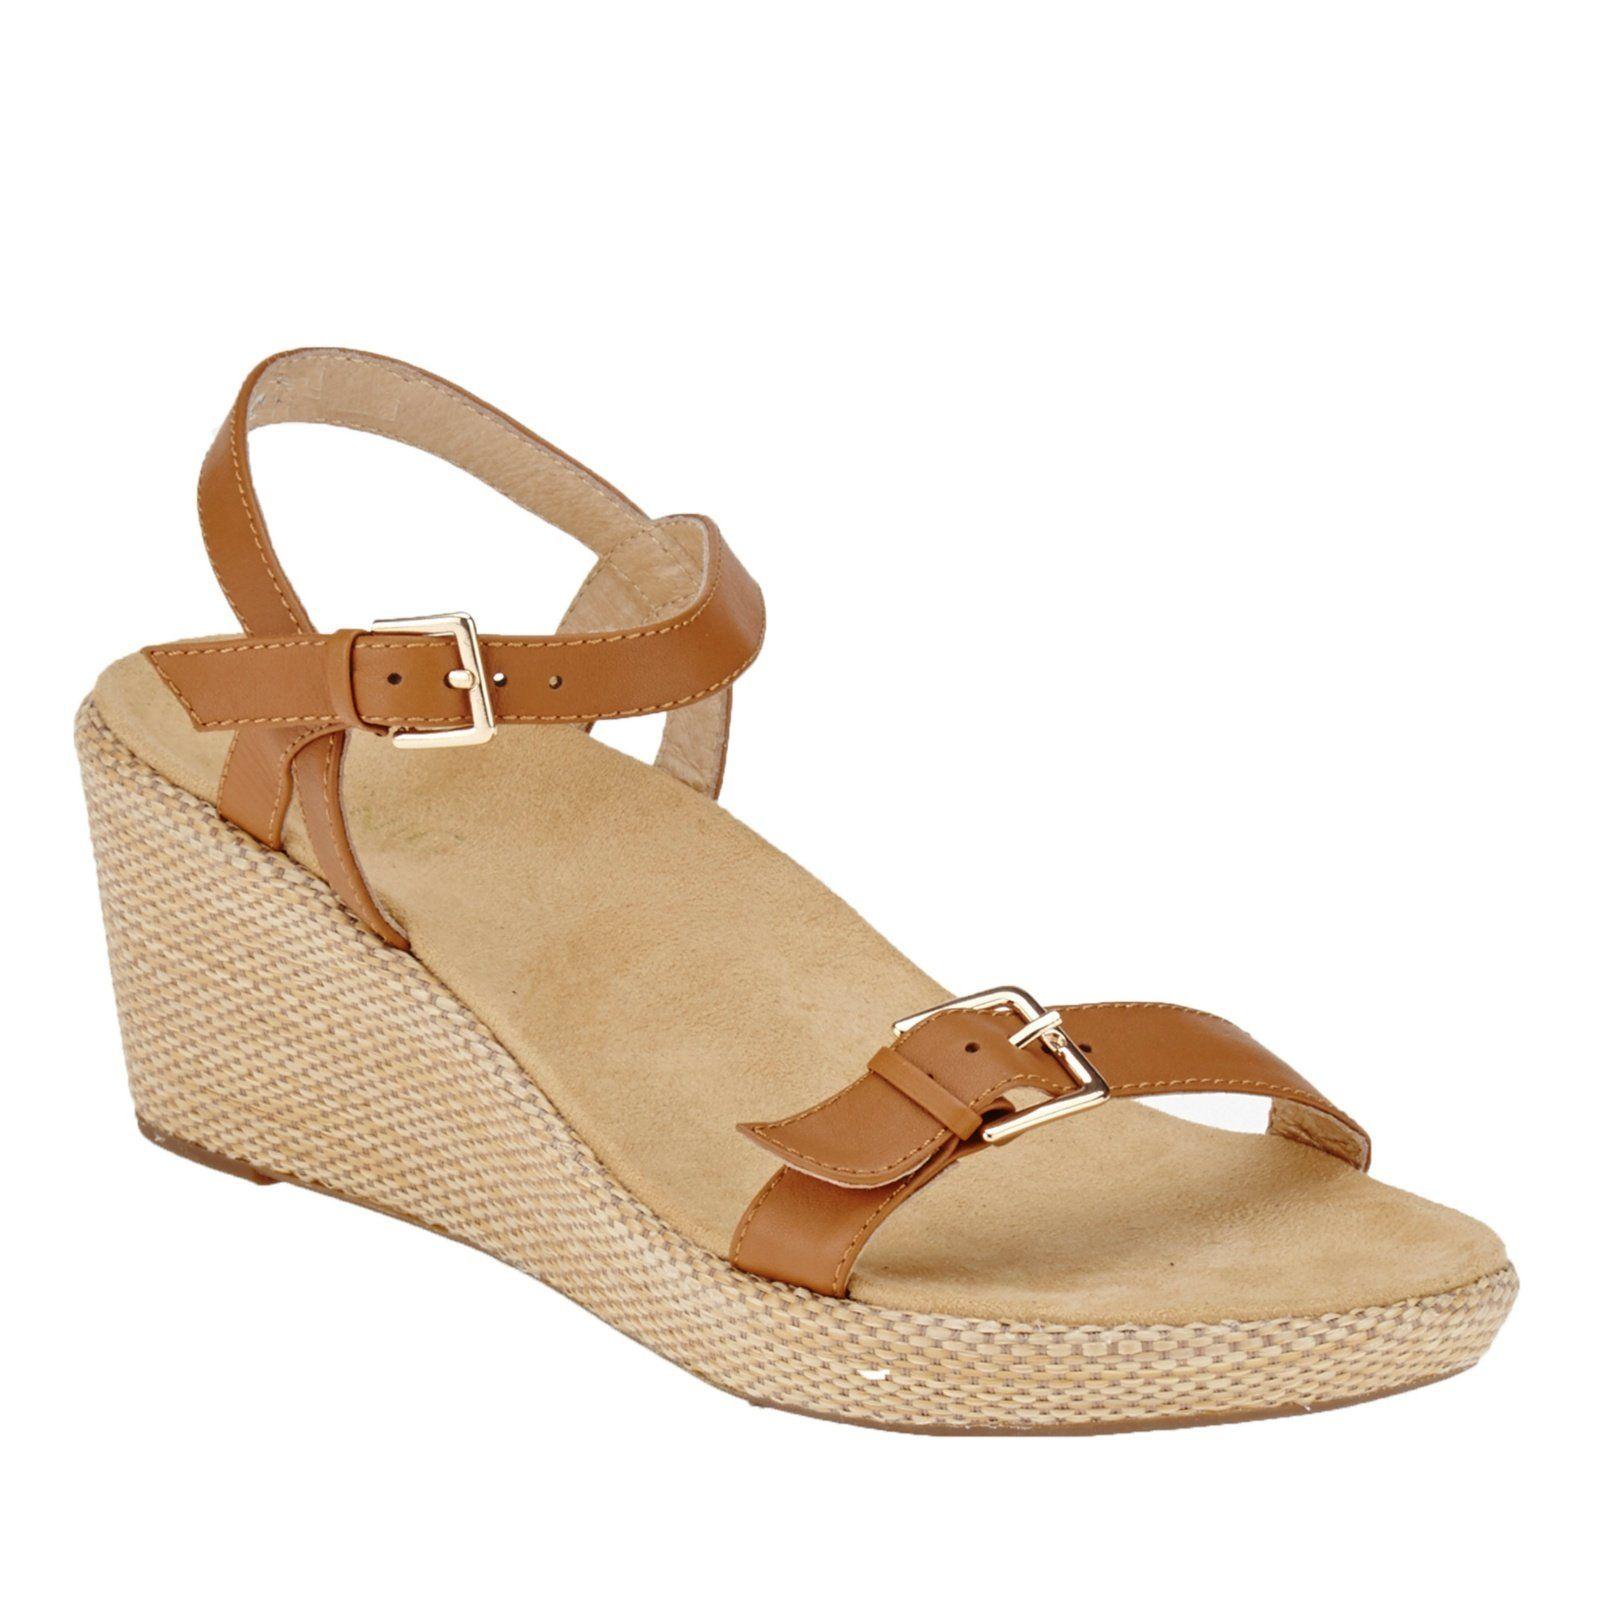 e56840da5047f Amazon.com: Vionic Enisa Women's Backstrap Orthotic Sandal: Shoes ...